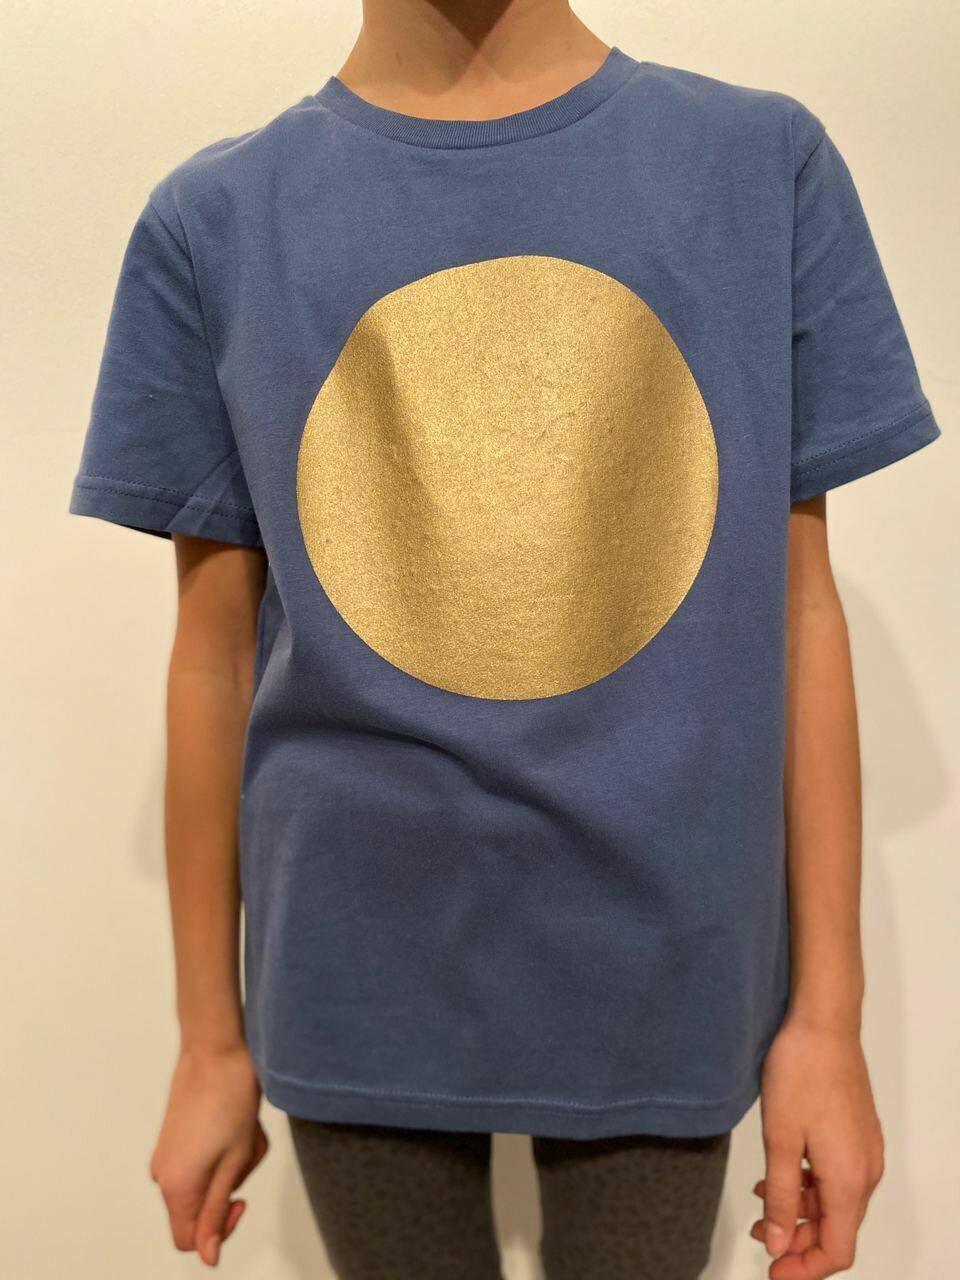 BE GOLDEN by The Lovers, Kinder T-shirt denim / Druck gold